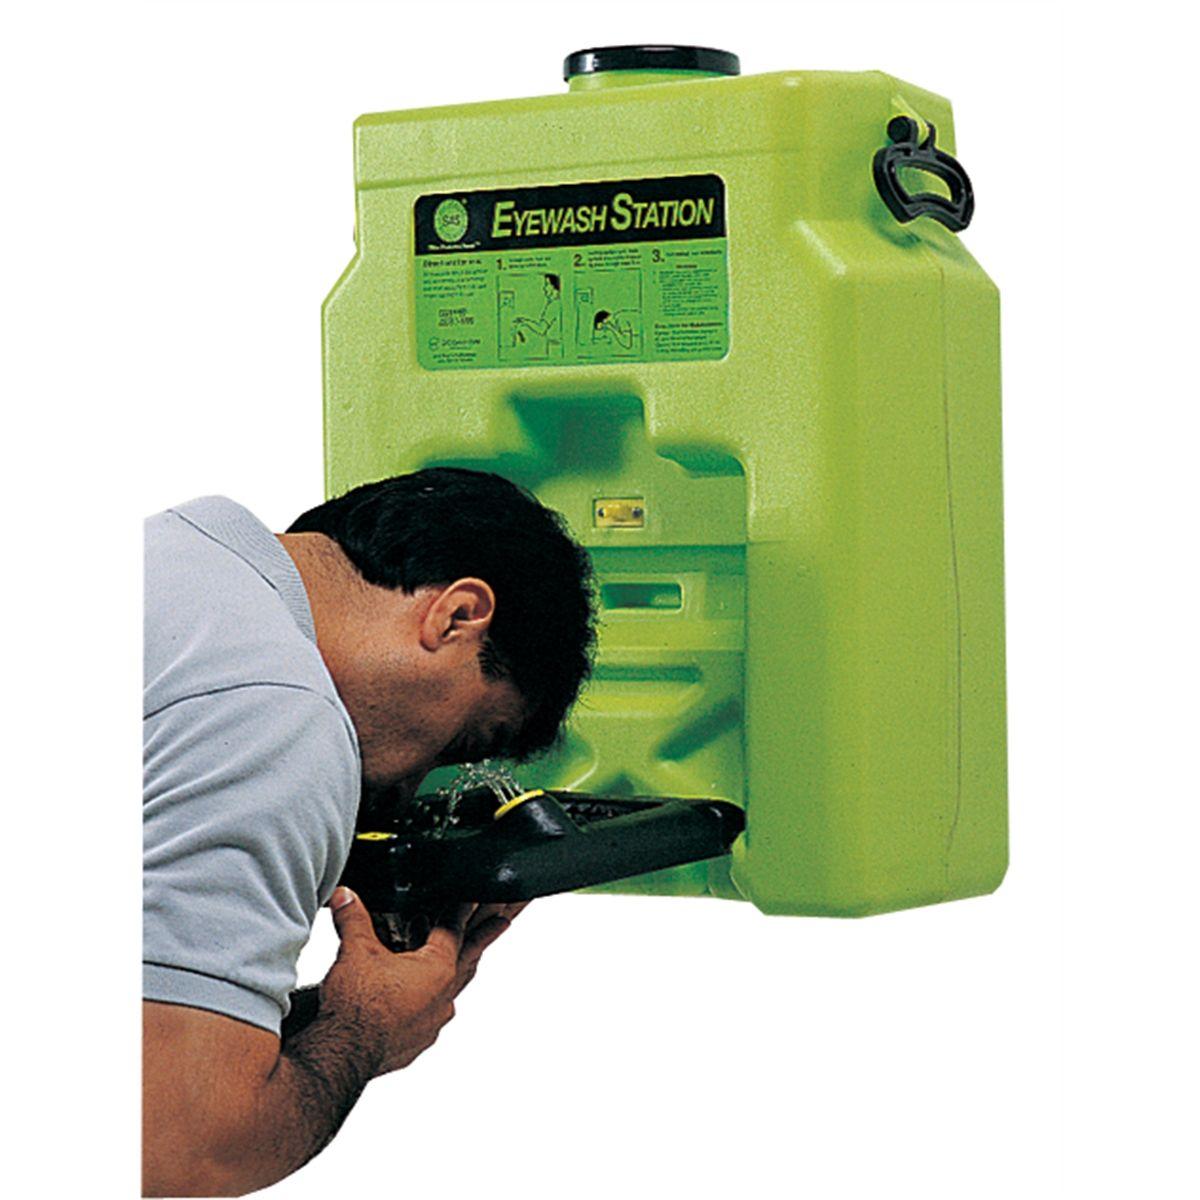 Sas Safety Corp 5135 Eye Wash Station Sas5135